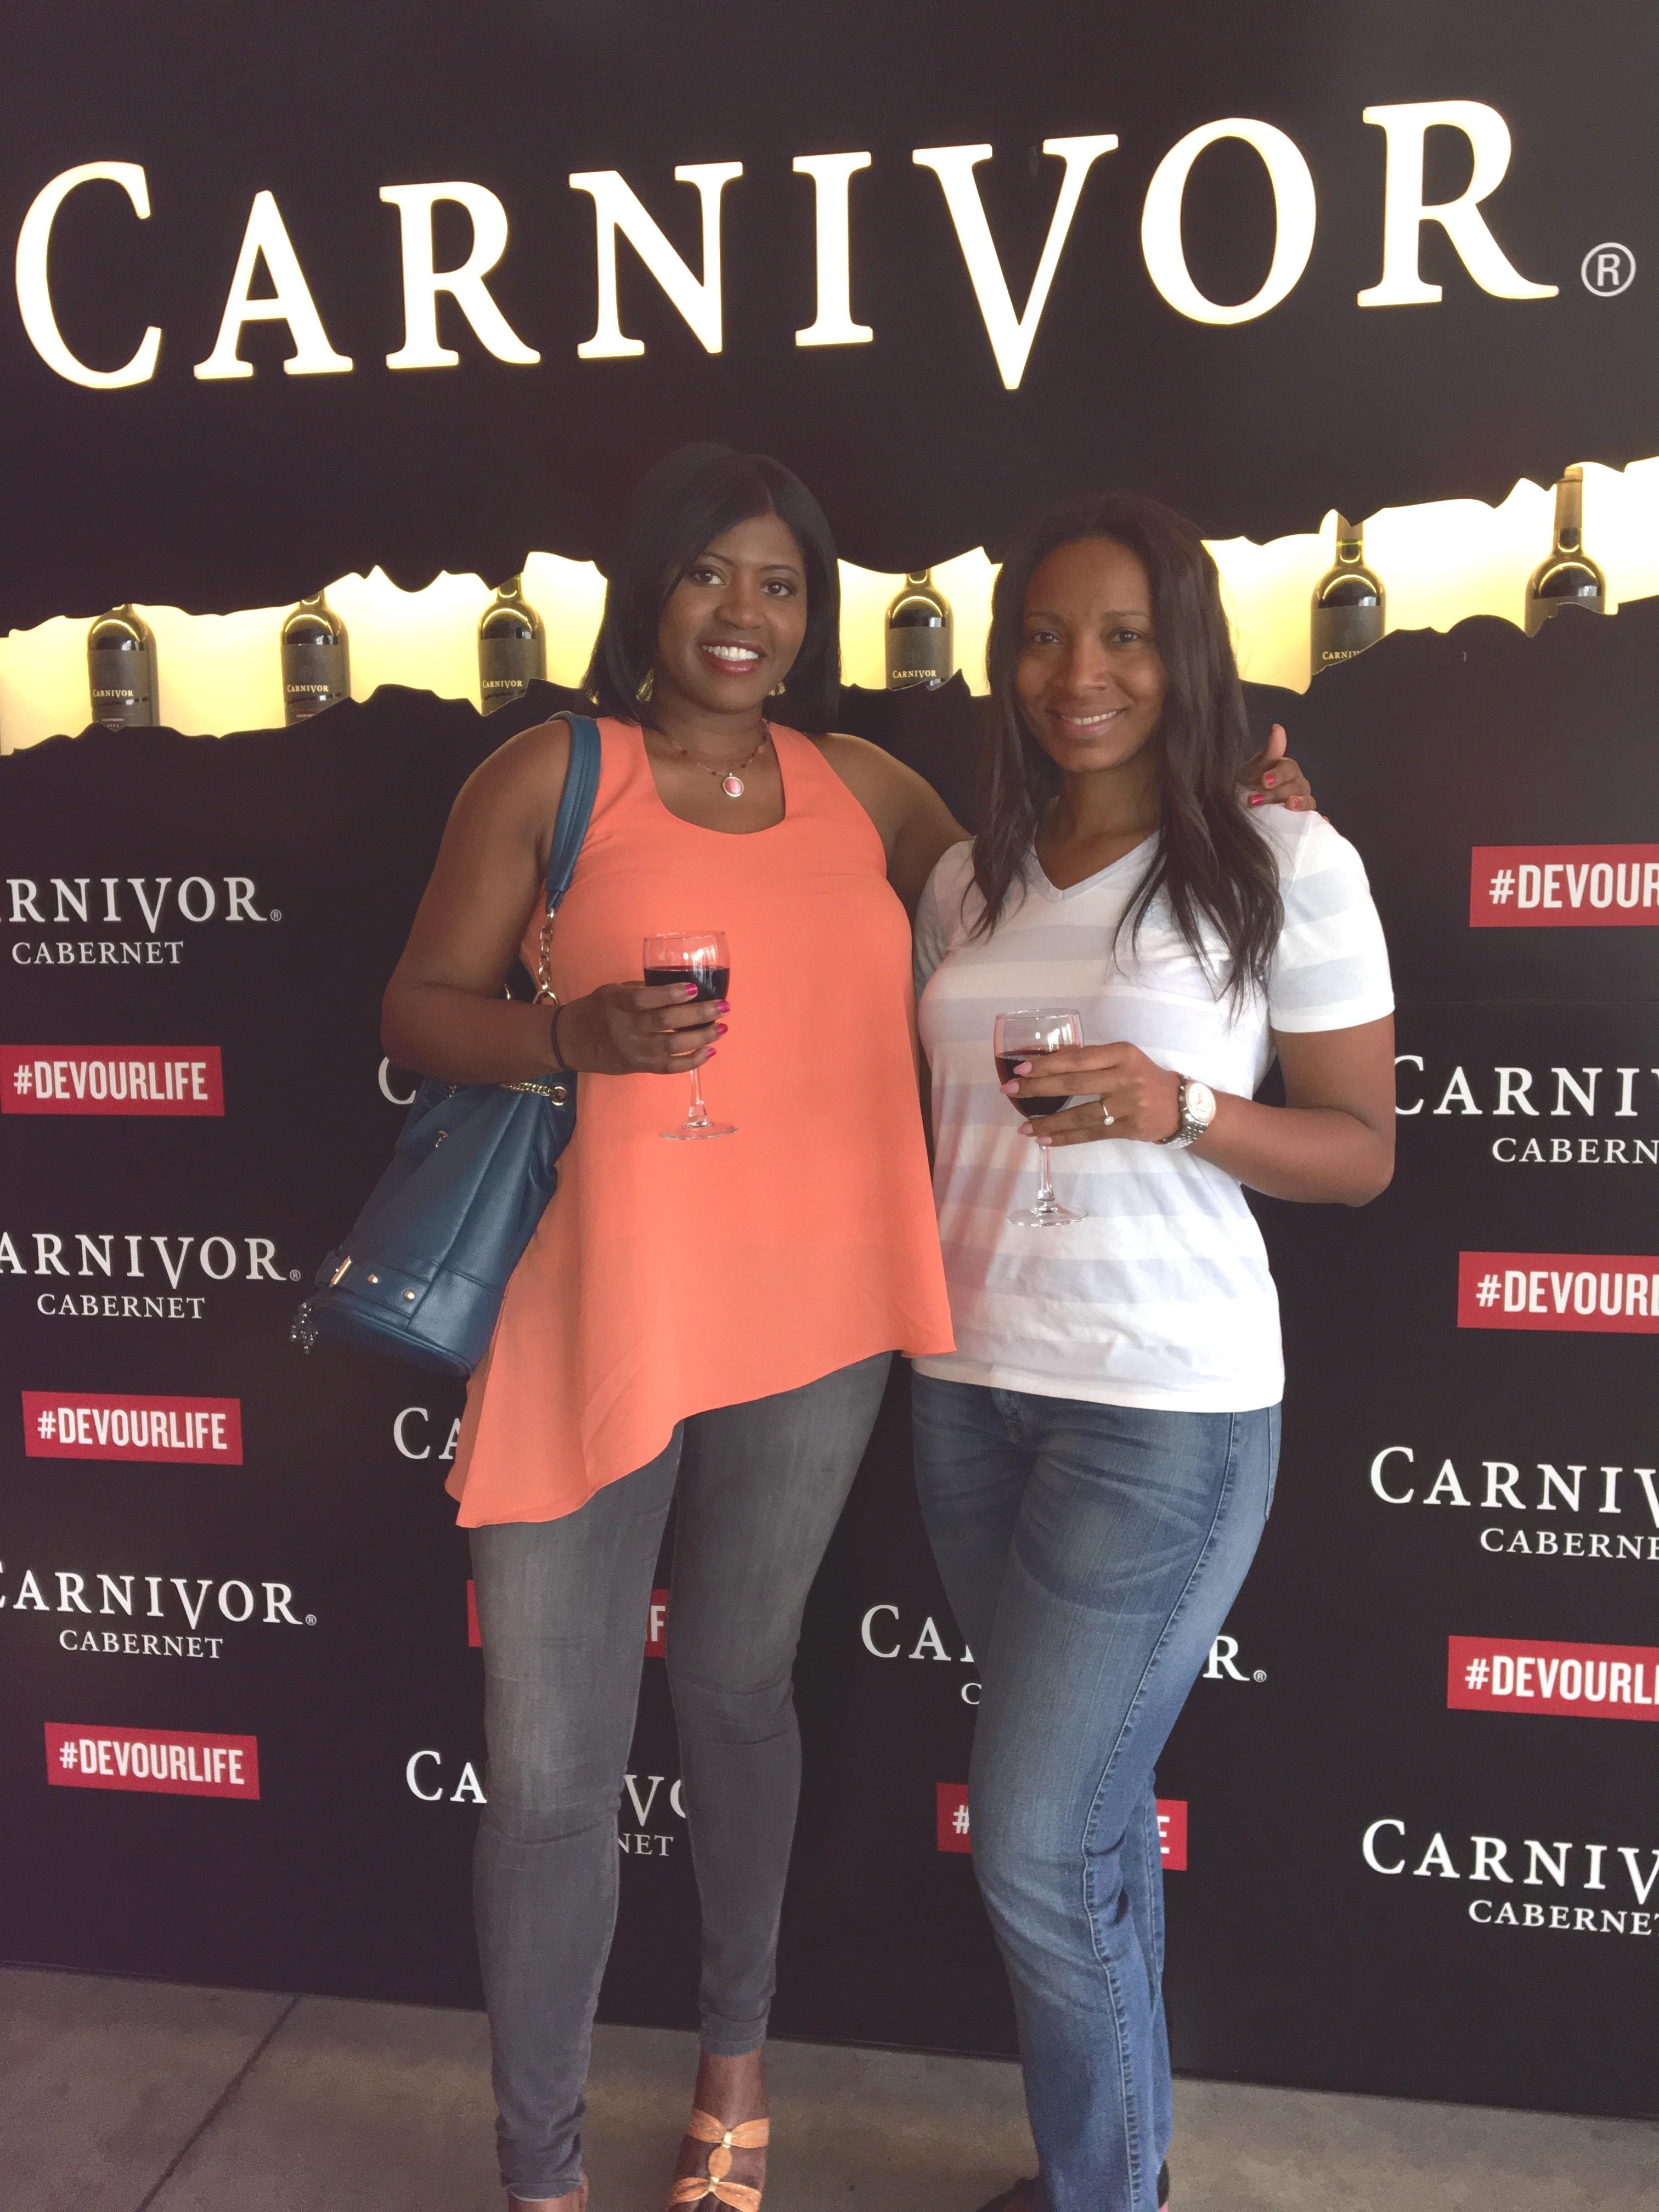 Carnivor Event